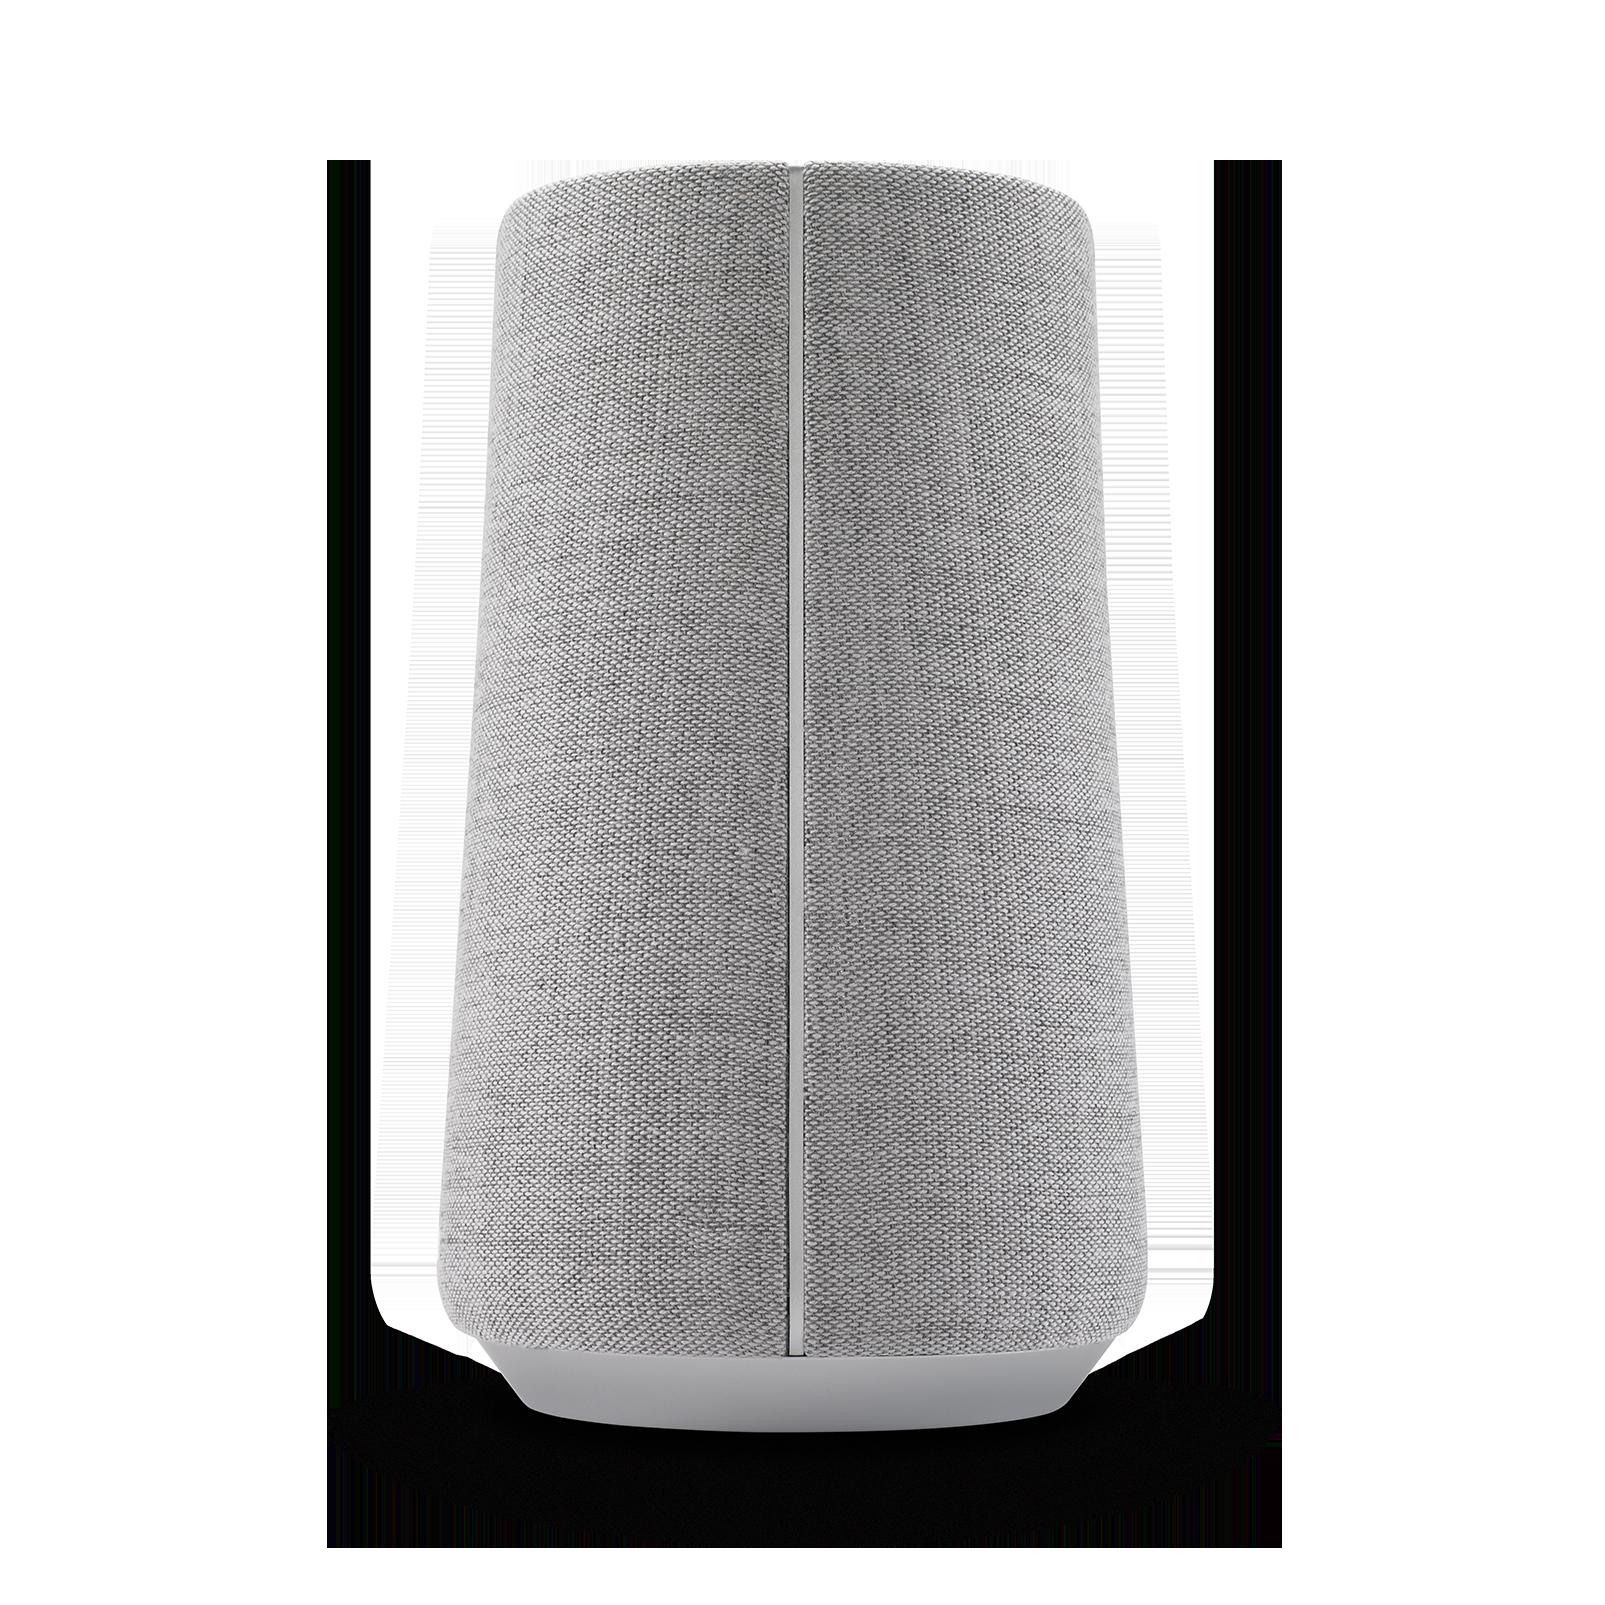 Harman Kardon Citation 100 - Grey - The smallest, smartest home speaker with impactful sound - Detailshot 1